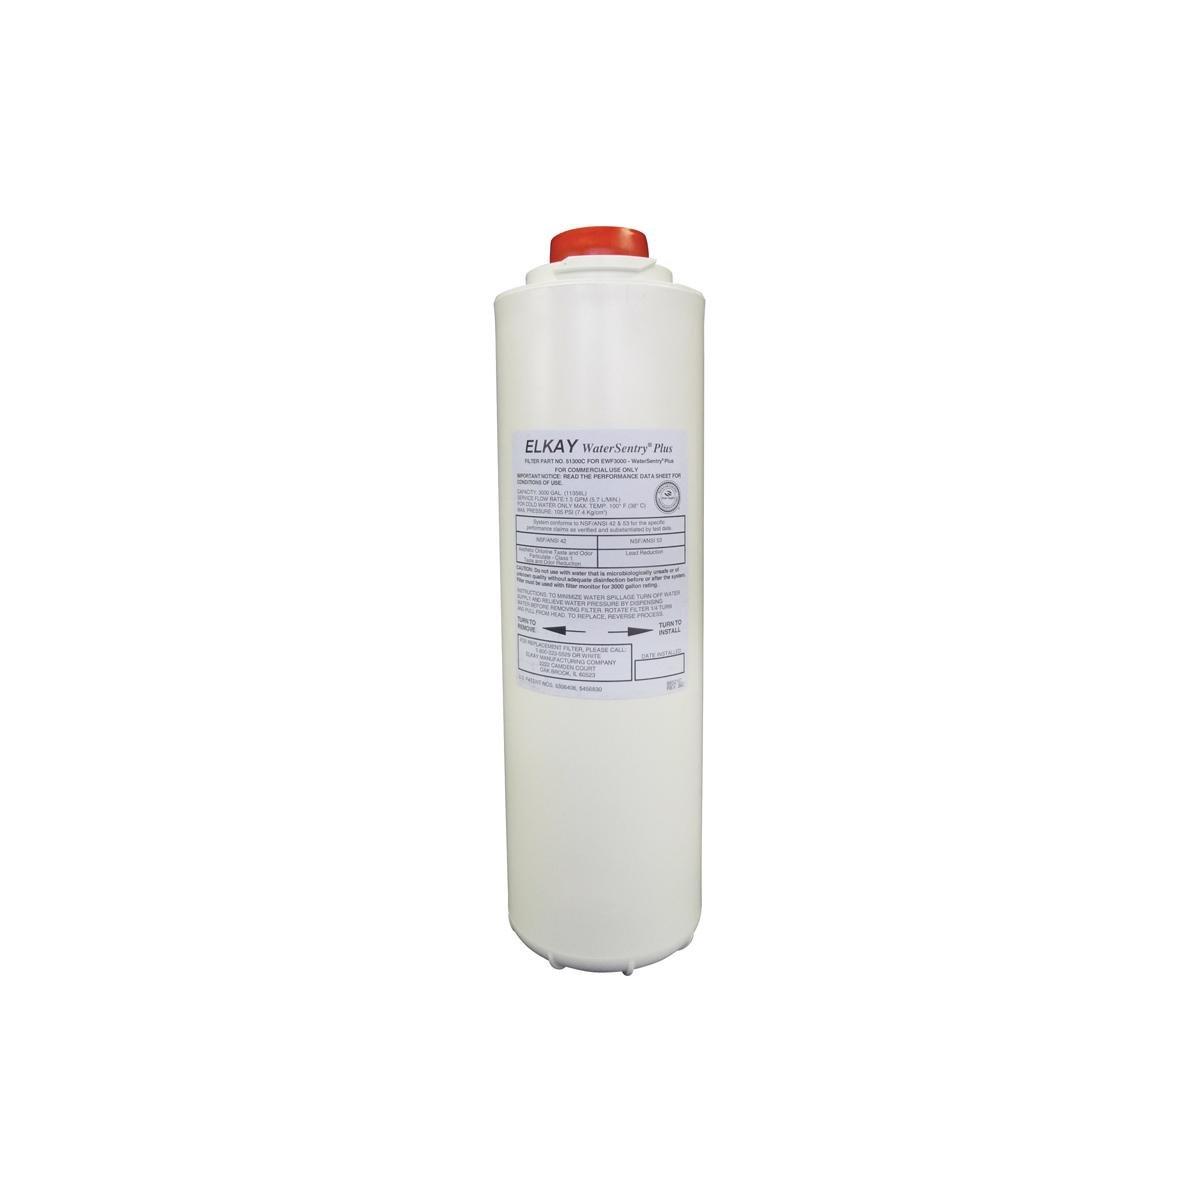 Elkay 51300C_12pk Watersentry Plus Replacement Filters (12) (Bottle Fillers)